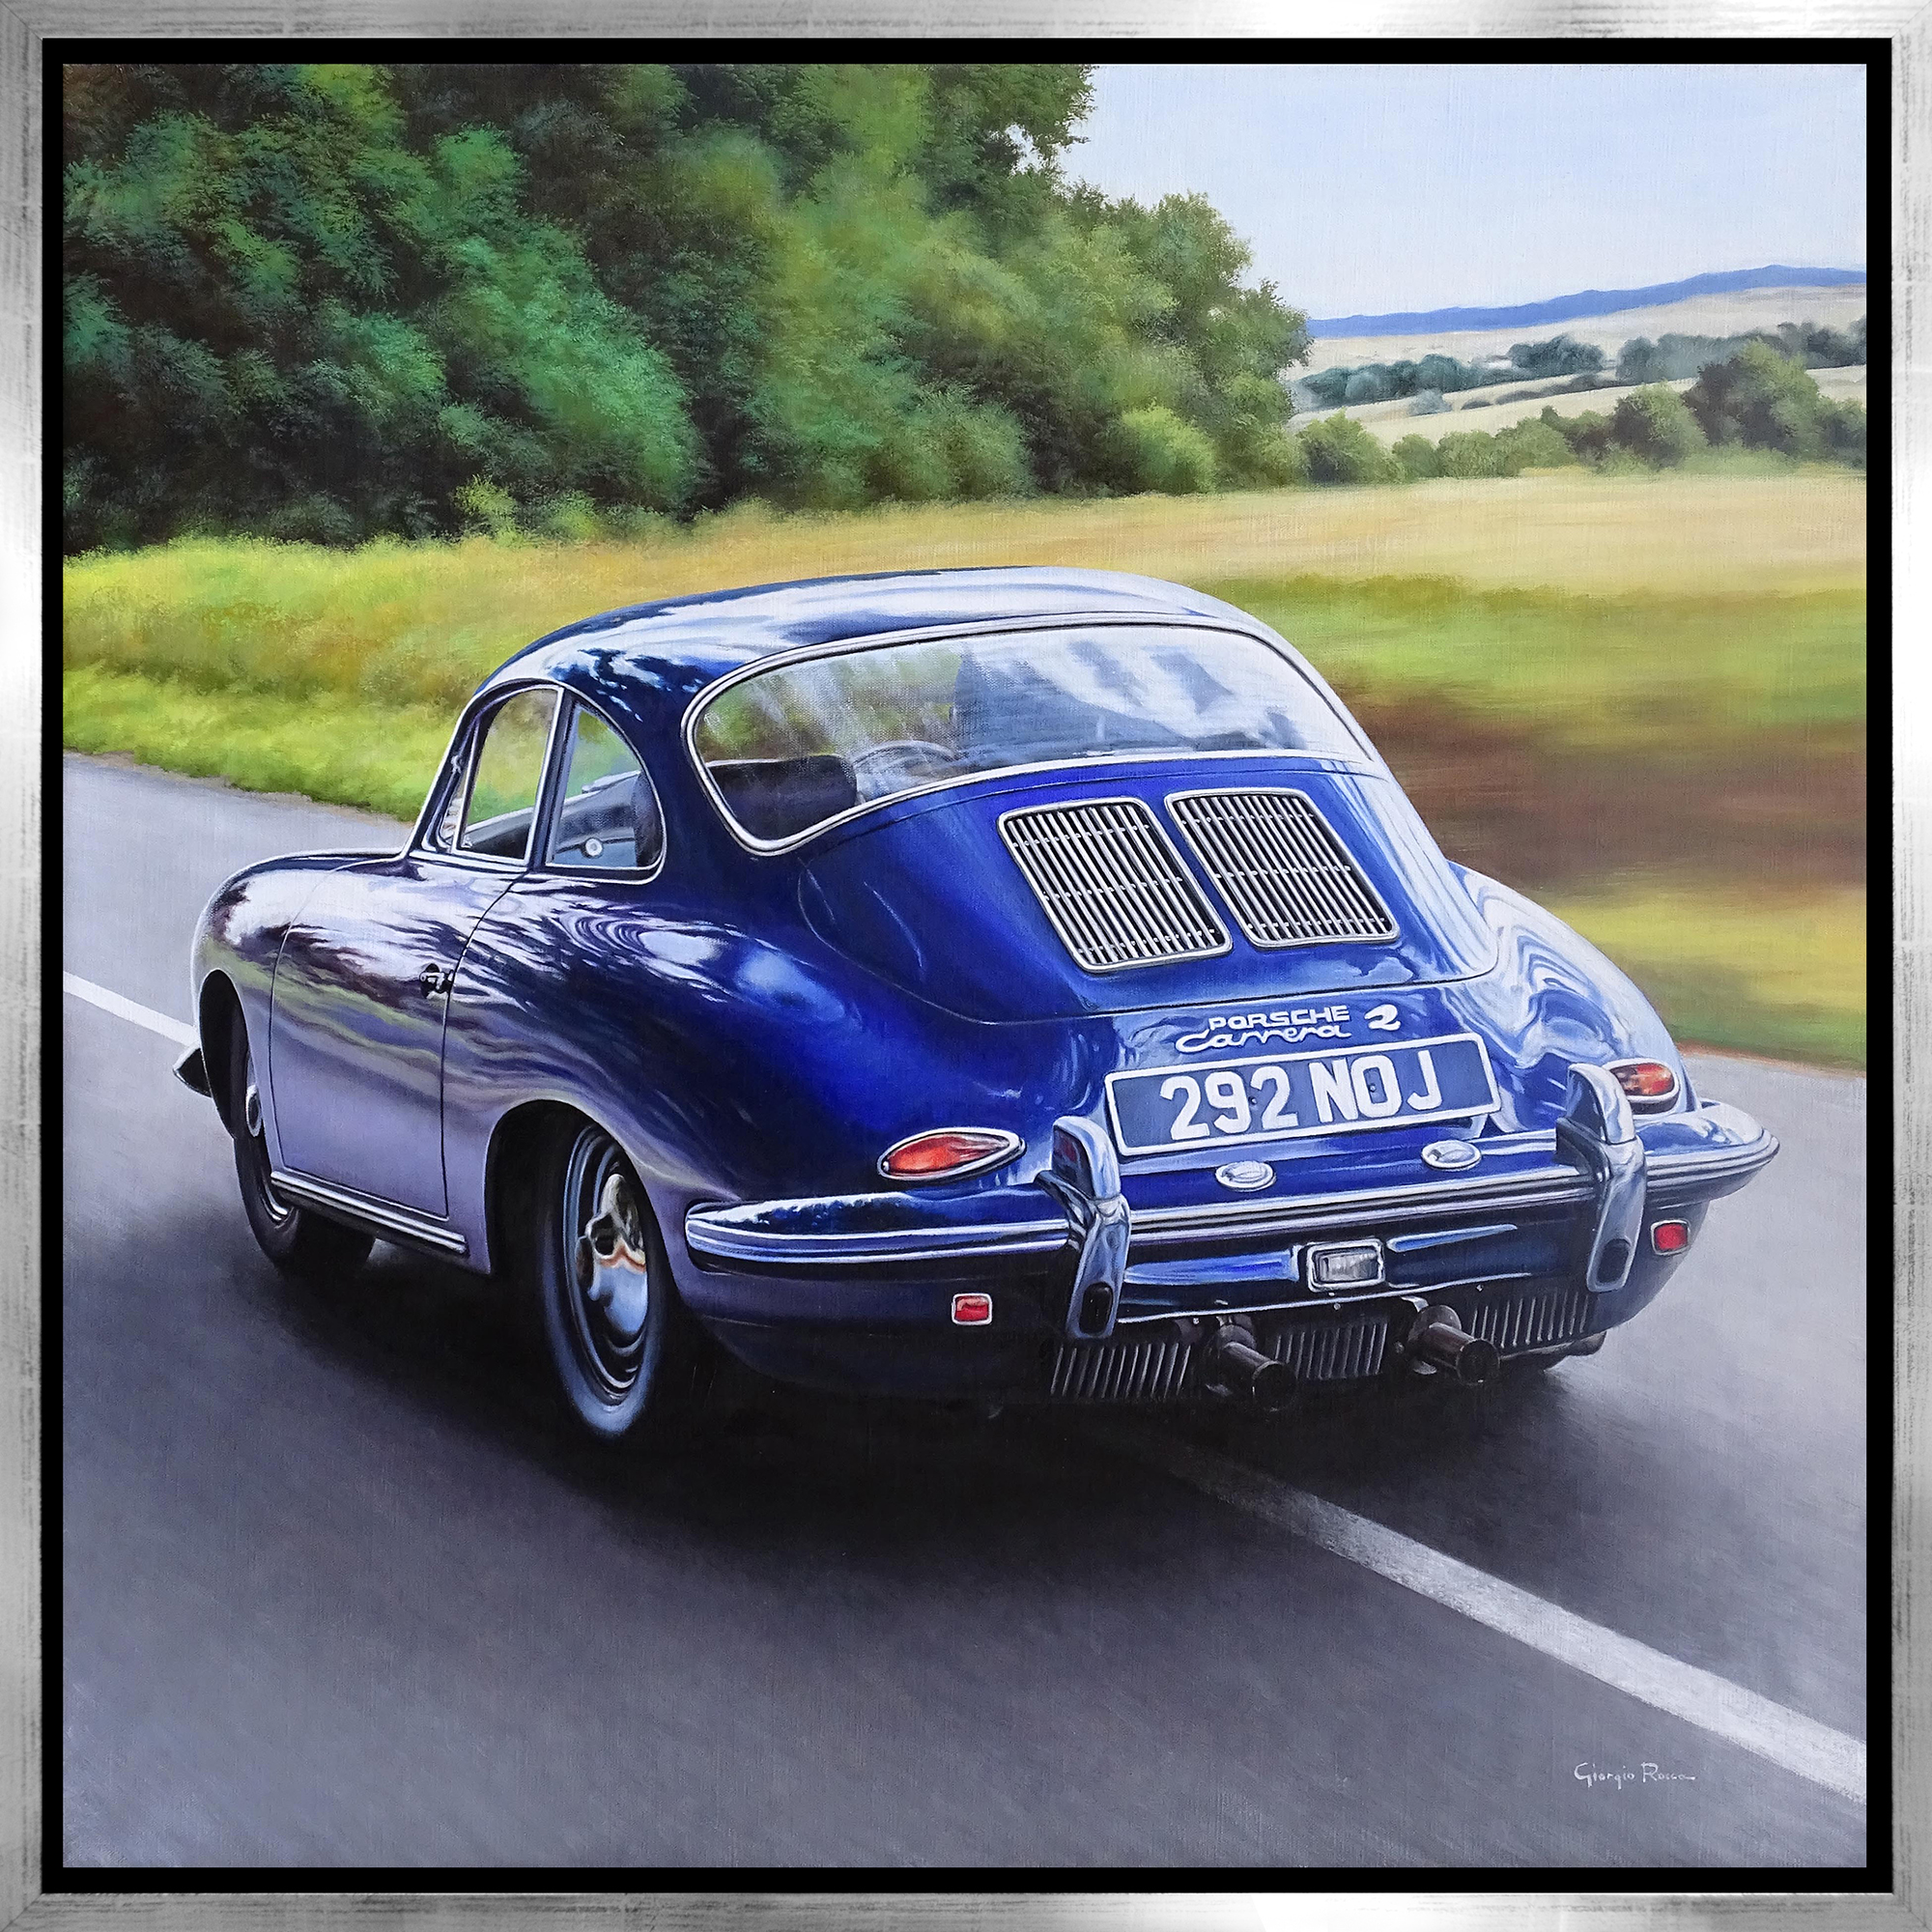 Giorgio Rocca - Porsche Blue , 7092-006-062